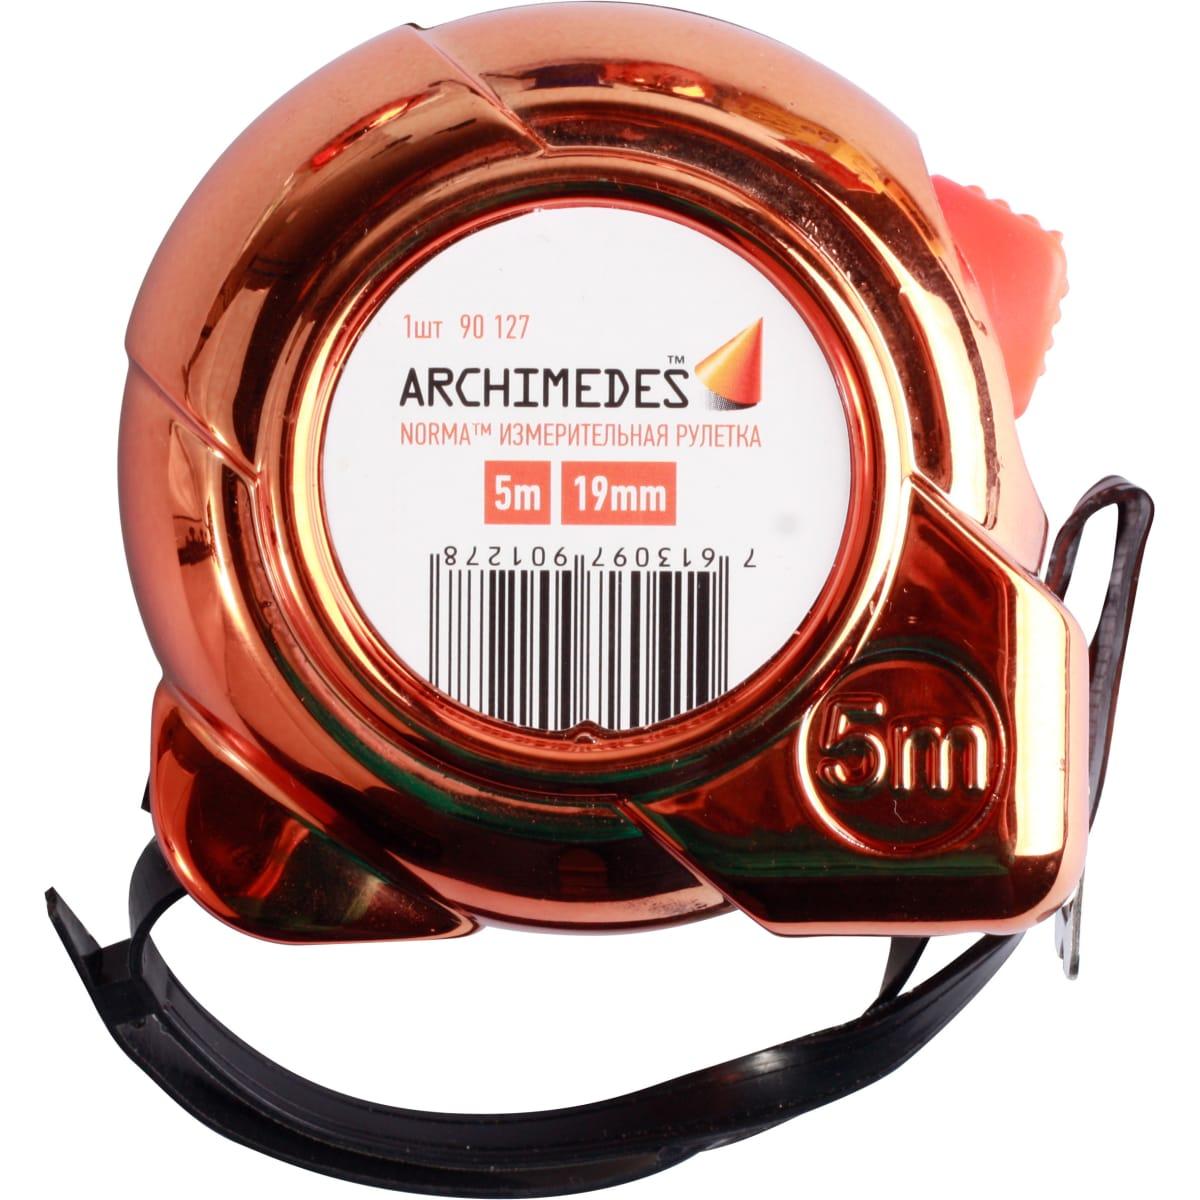 Рулетка ARCHIMEDES 5м 90127